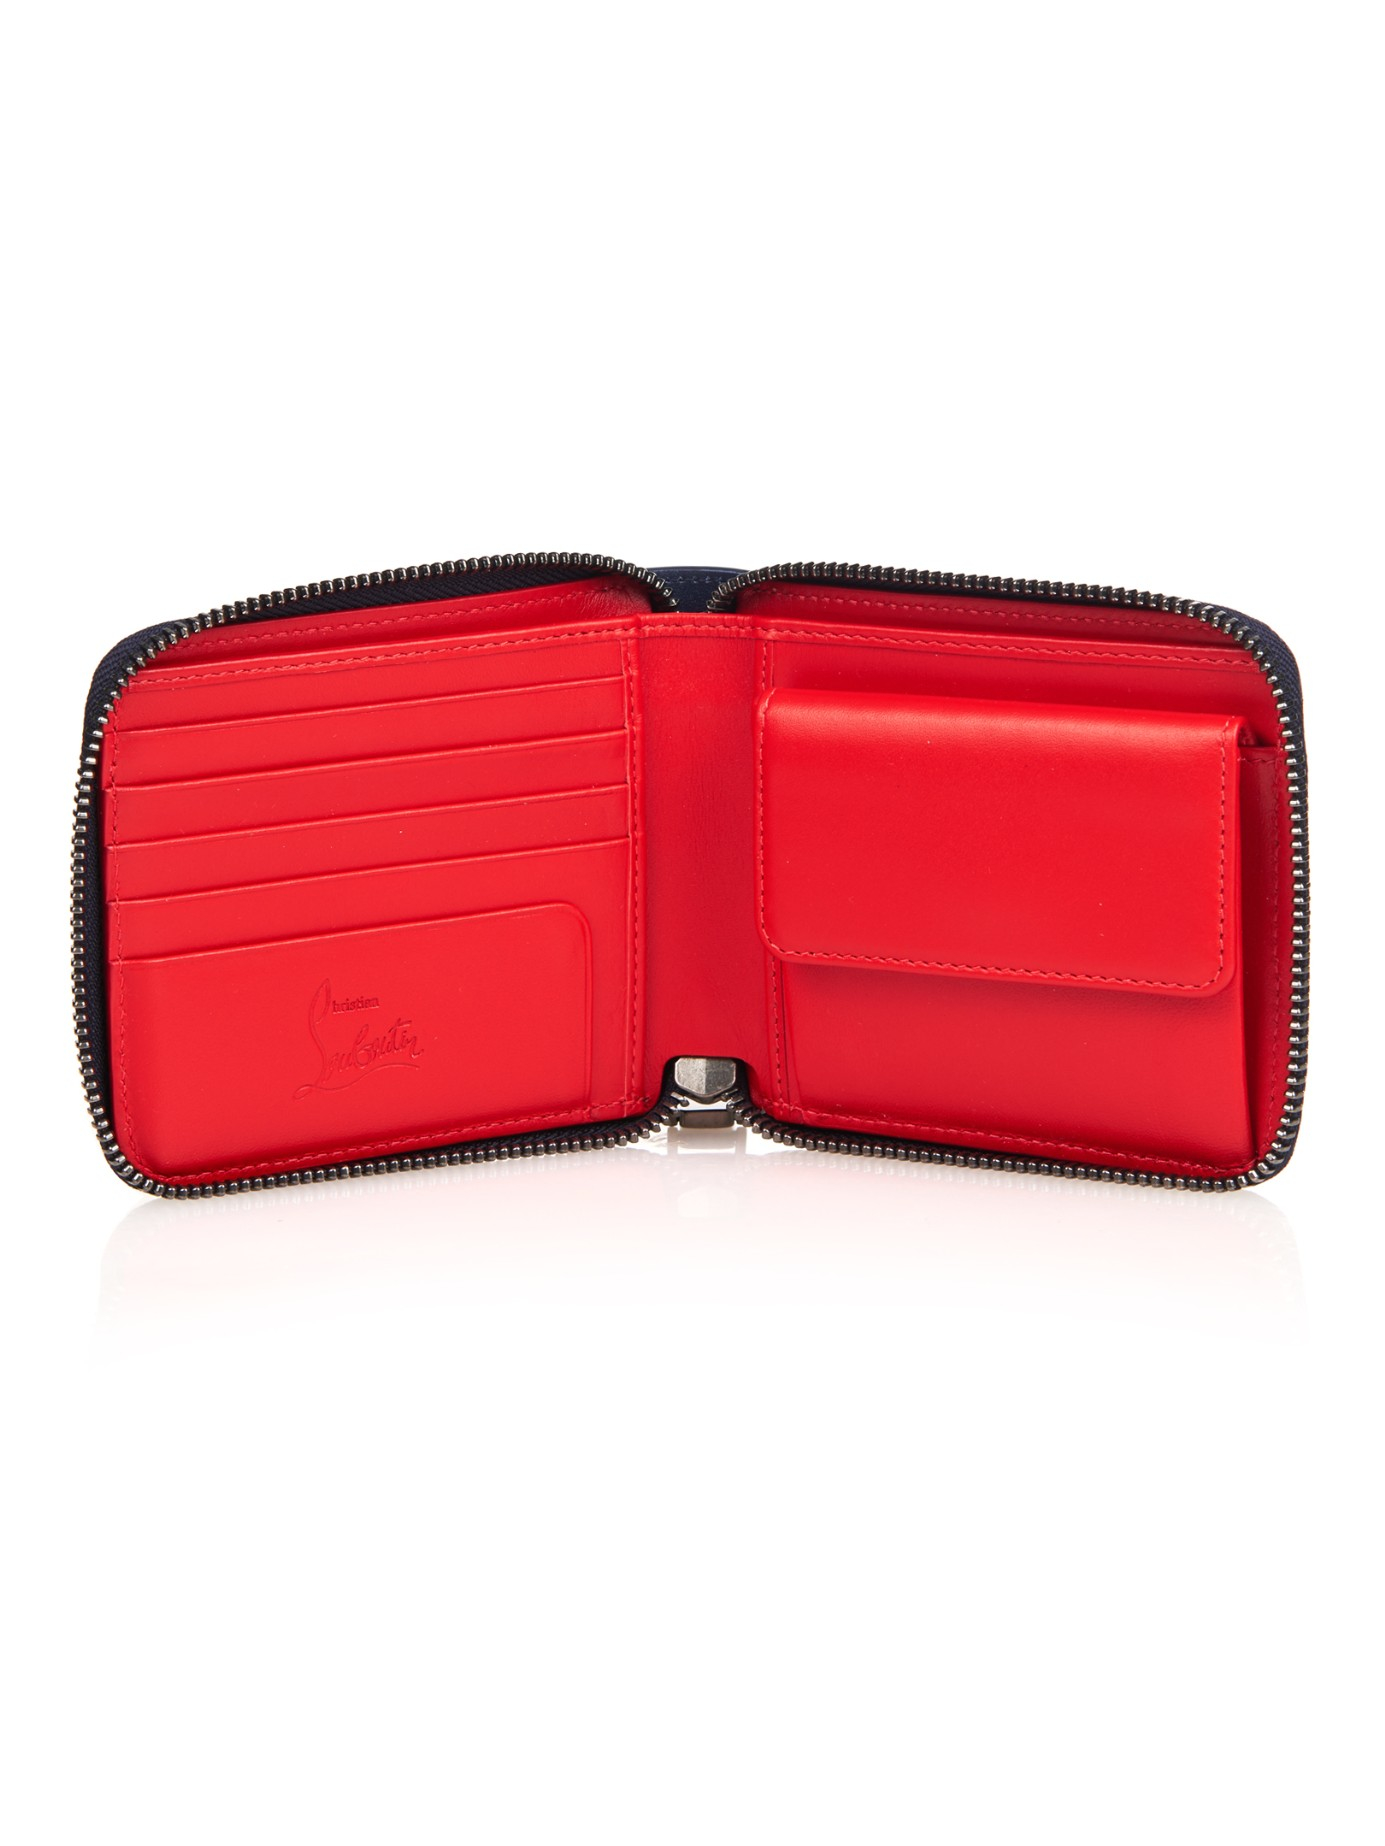 christian louboutin zip around wallet